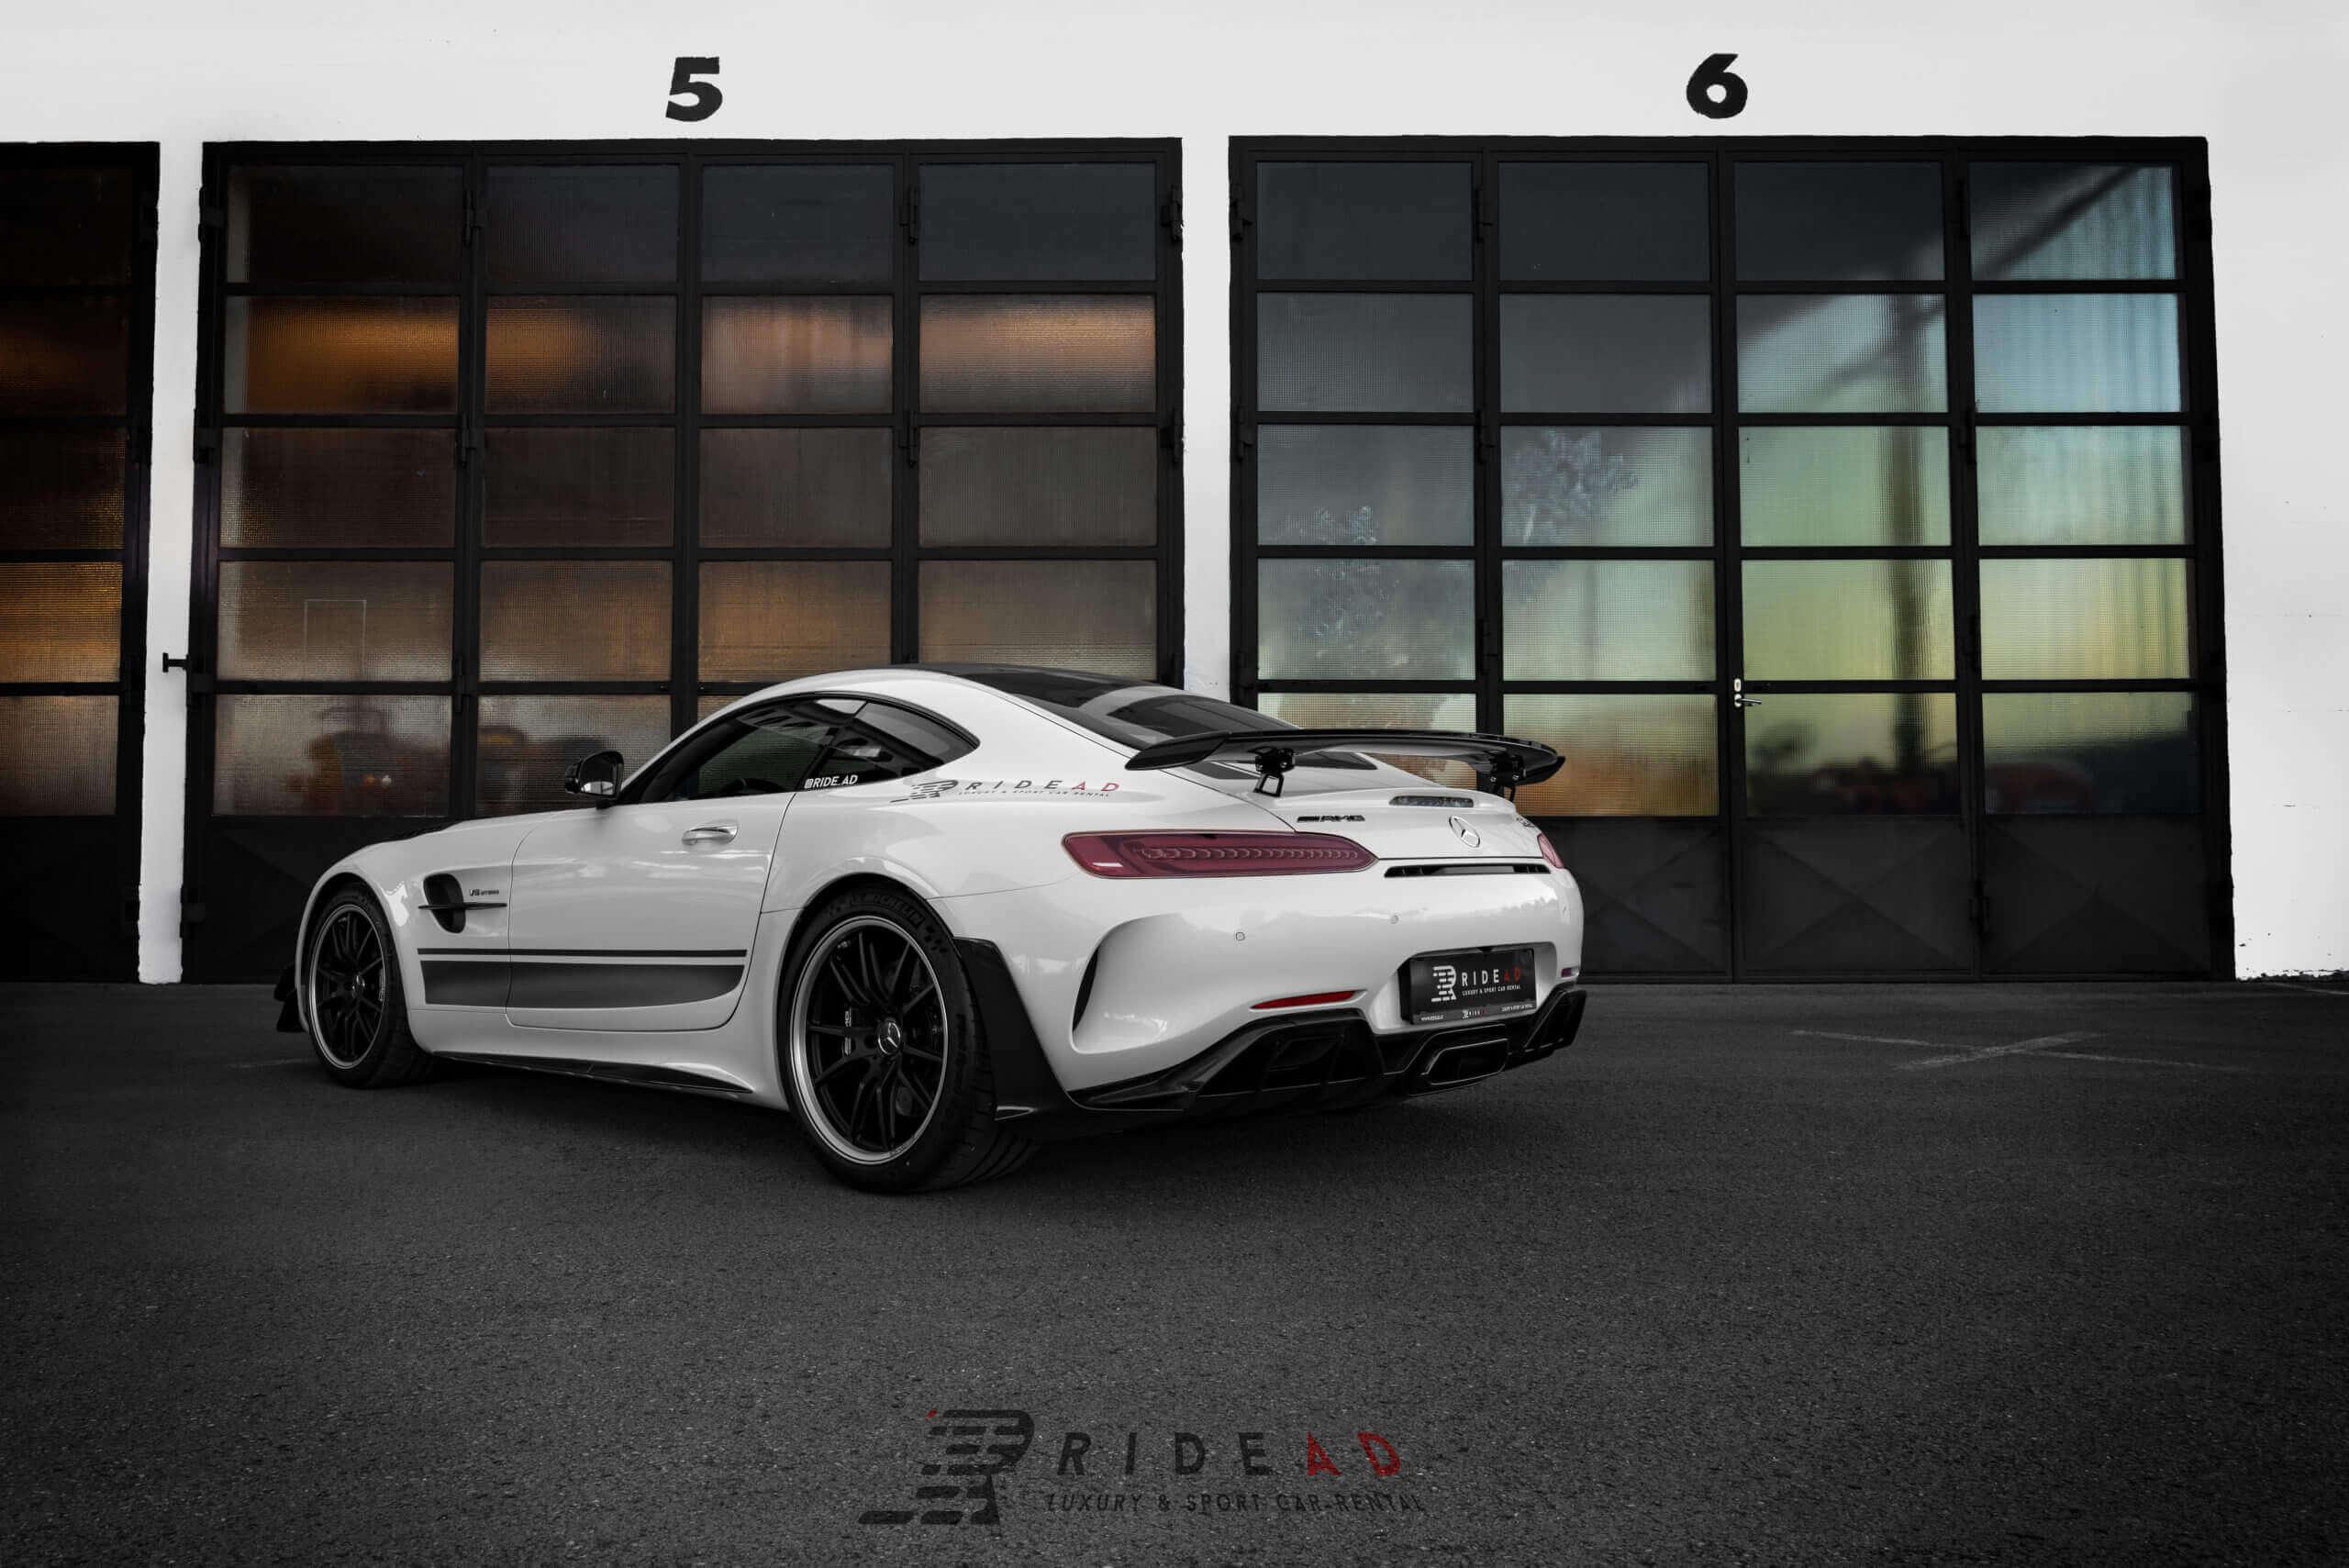 Ride Ad Luxury and Sports Car Rental - Mercedes-Benz AMG GTR PRO Kurzzeitmiete 3